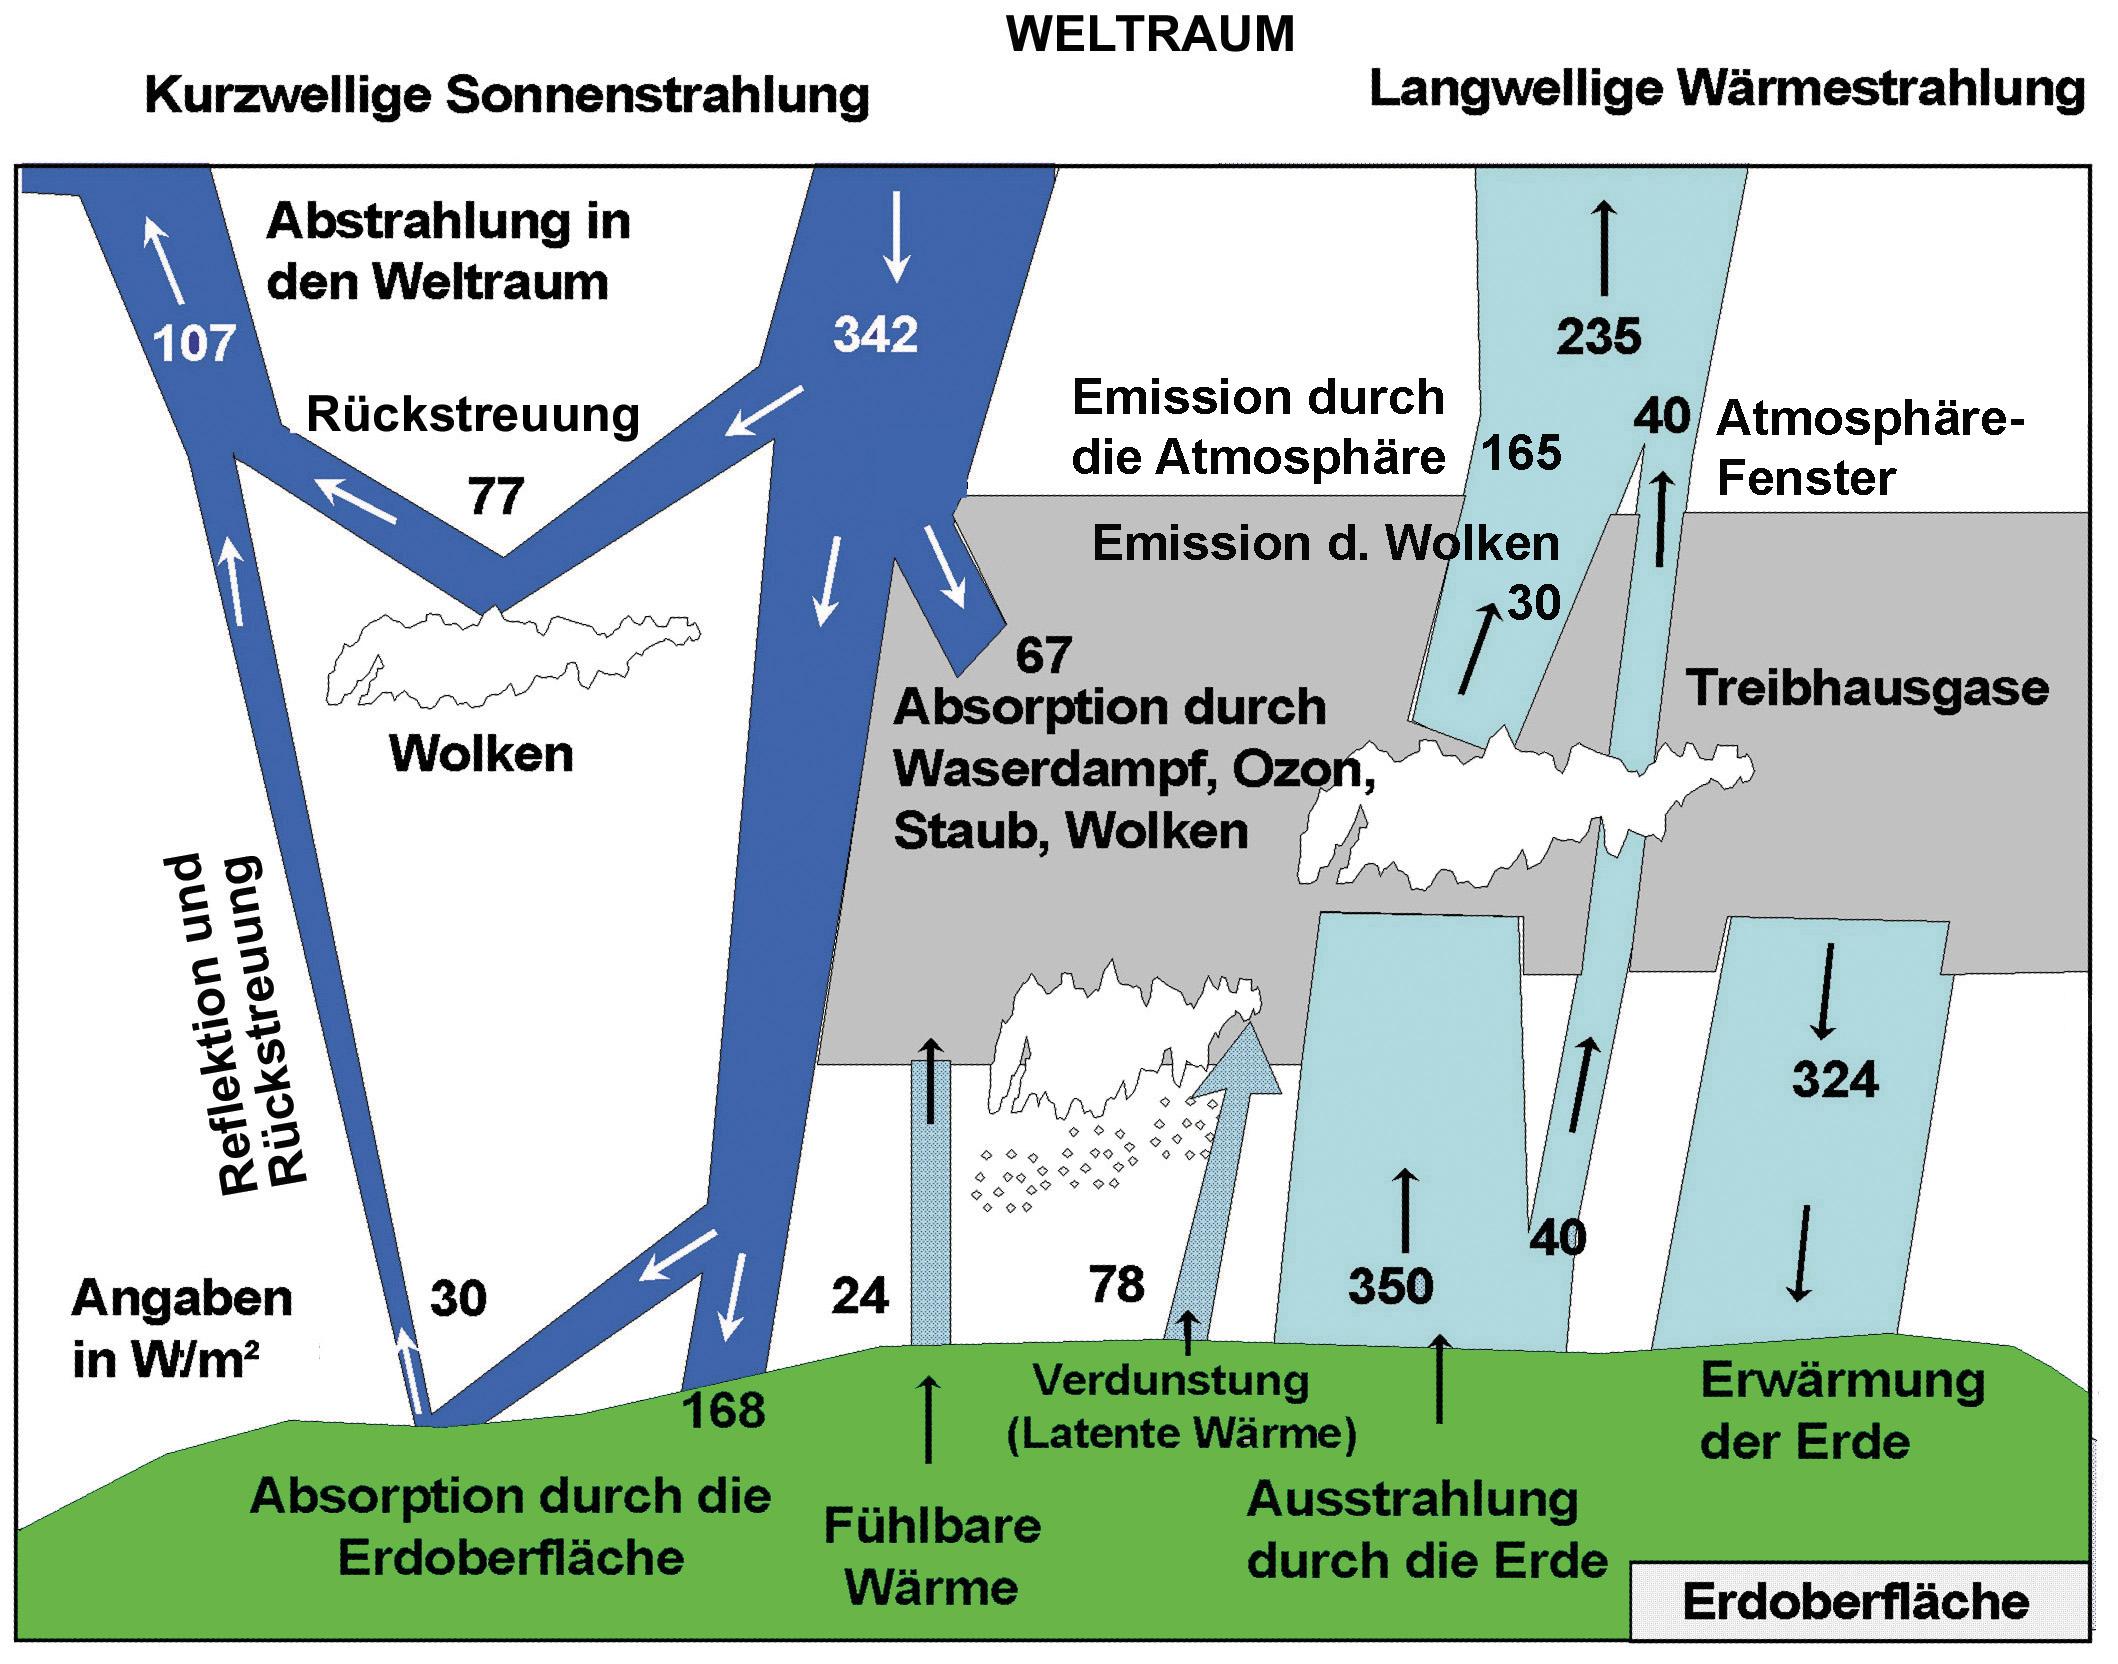 Globale Energiebilanz der Erde